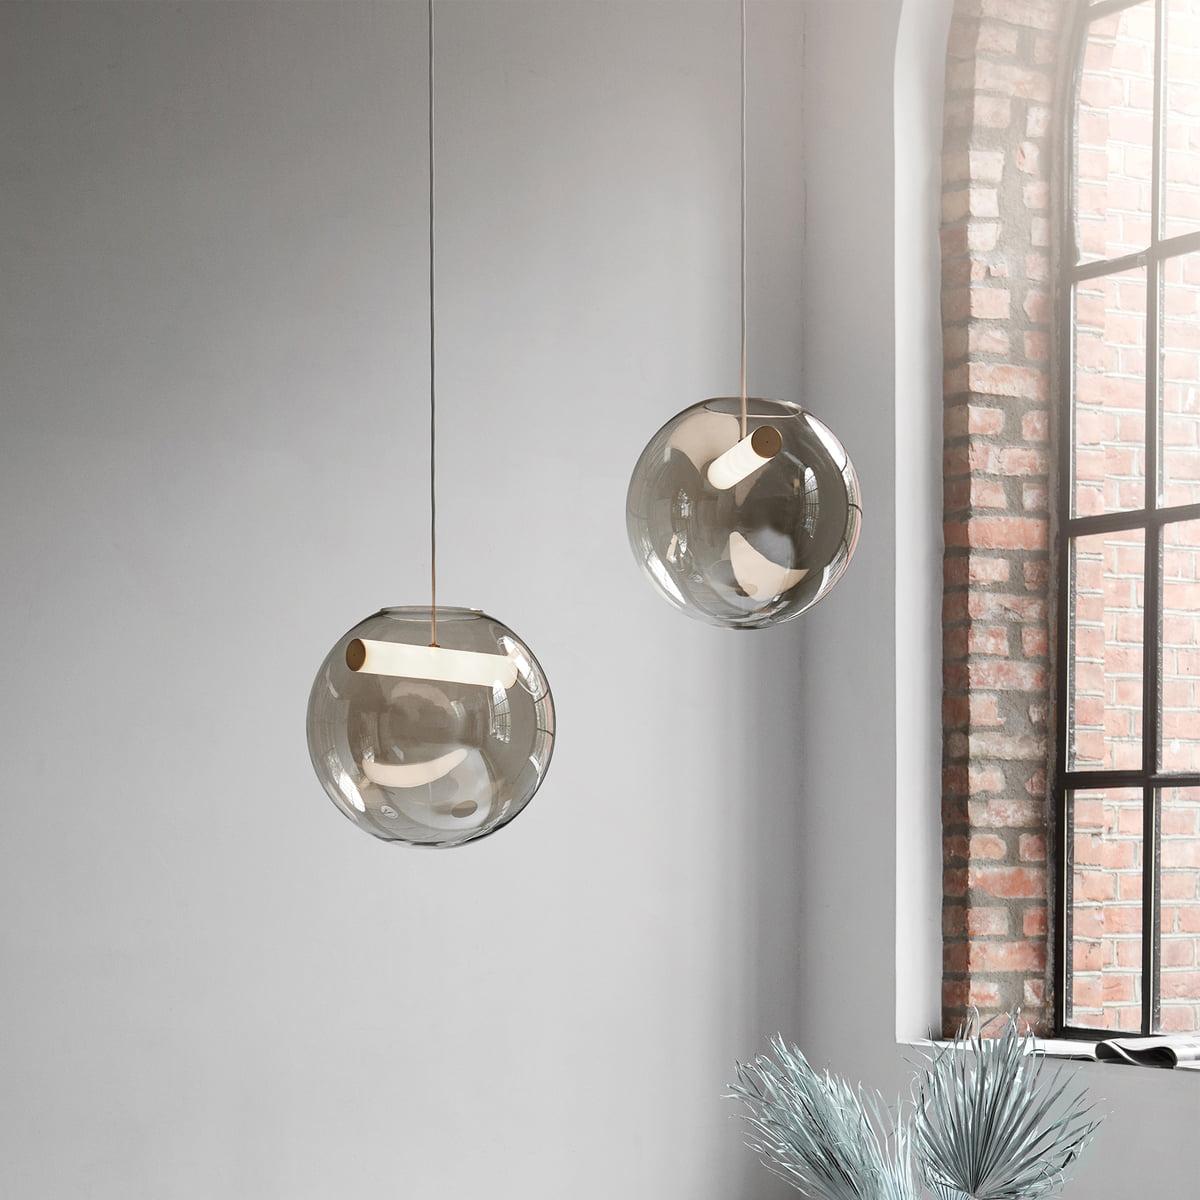 pendelleuchte glas grau 12 lampen